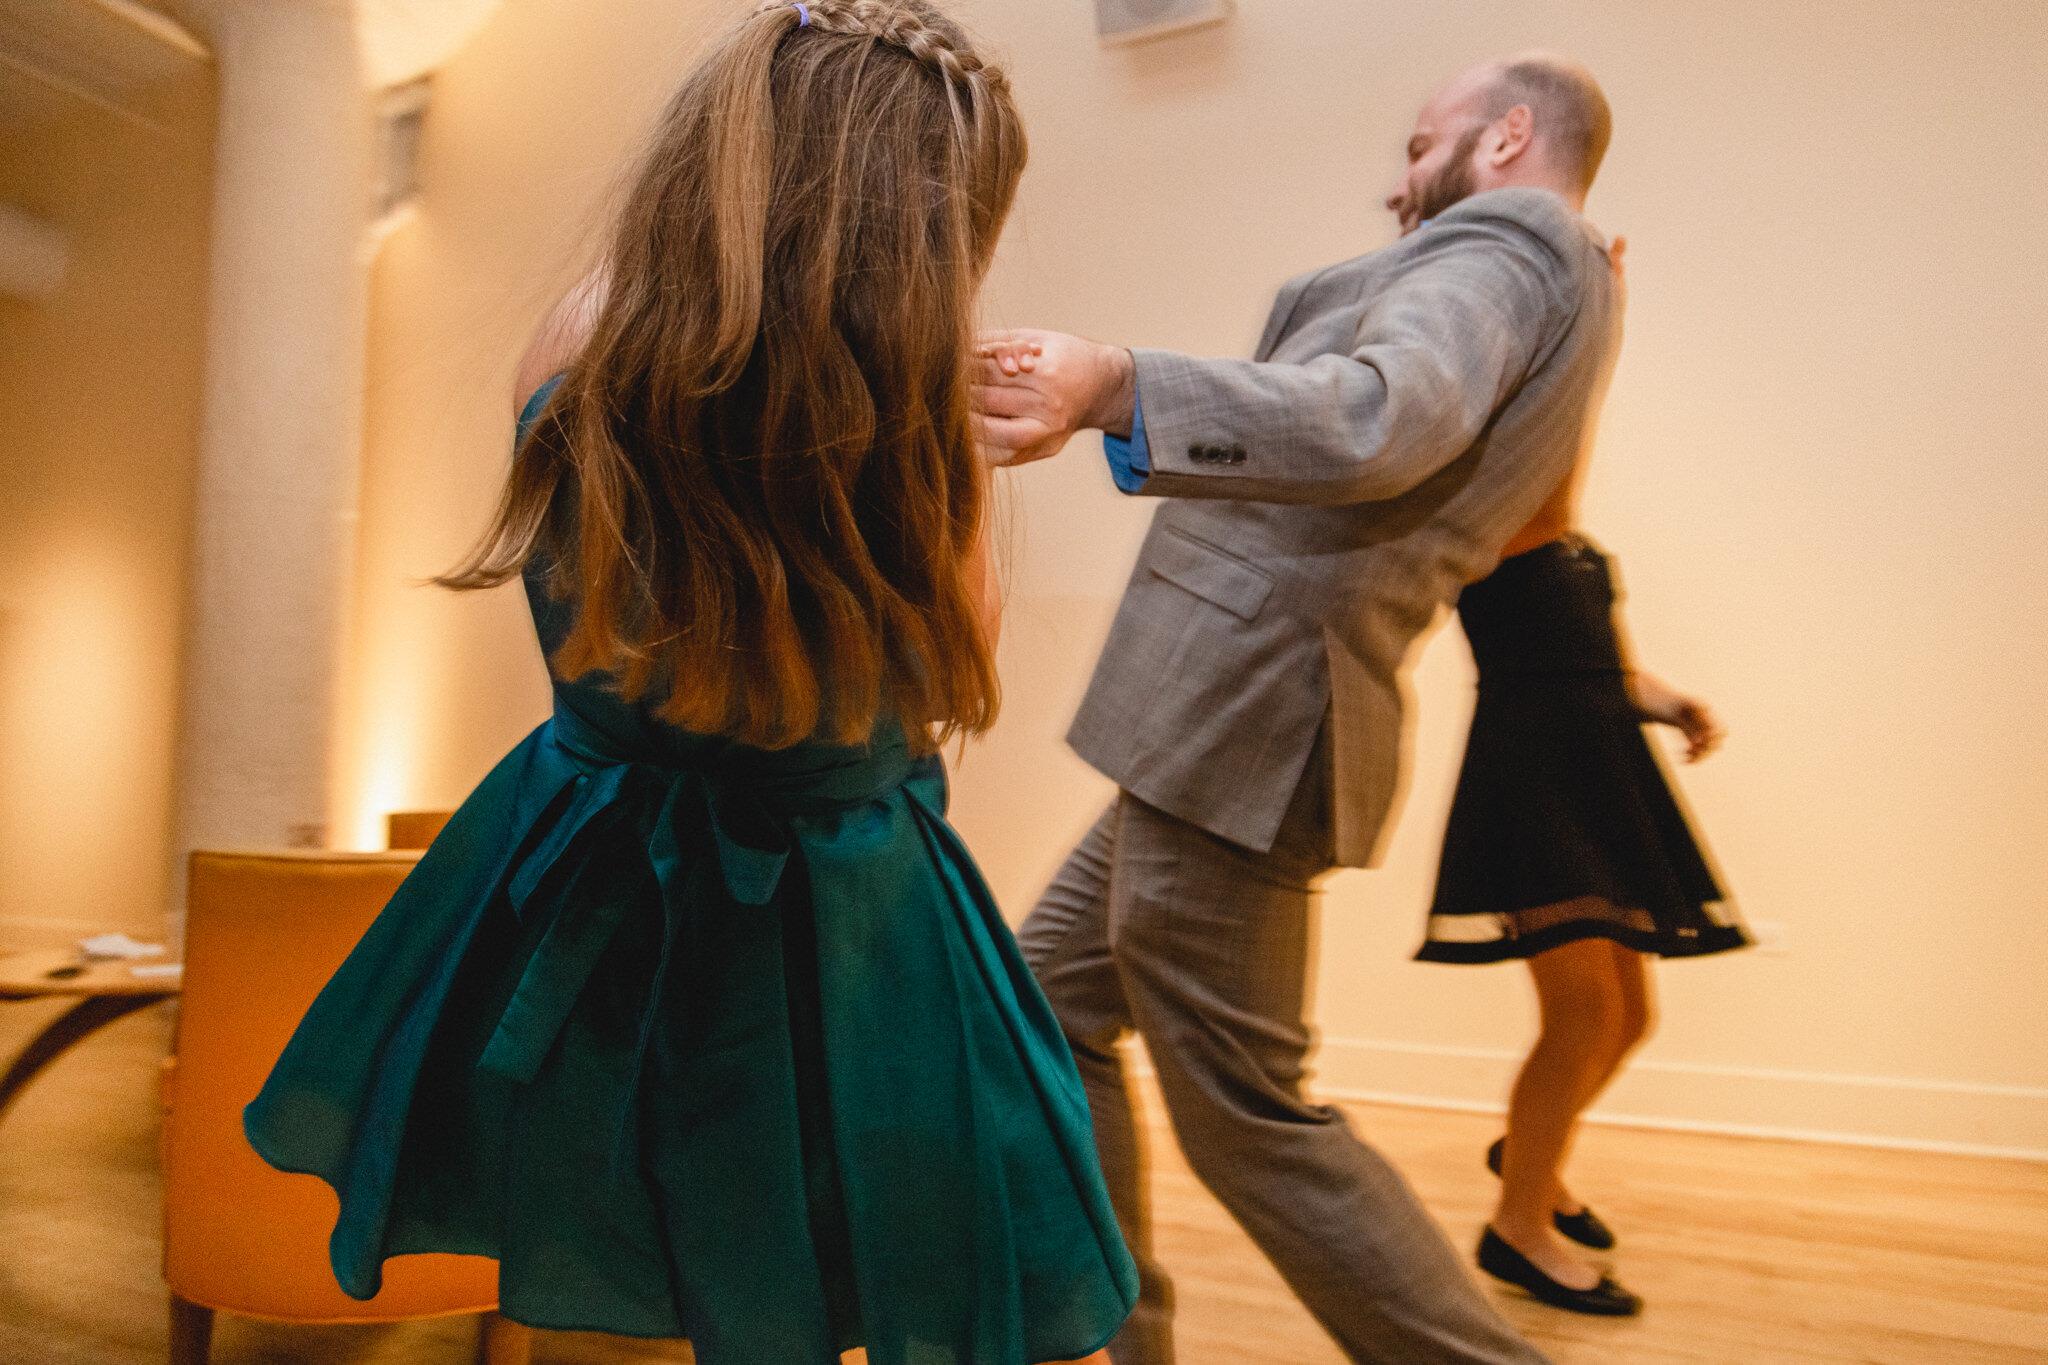 chicago-greenhouse-loft-wedding-dance-rebeccaylasotras-2.jpg